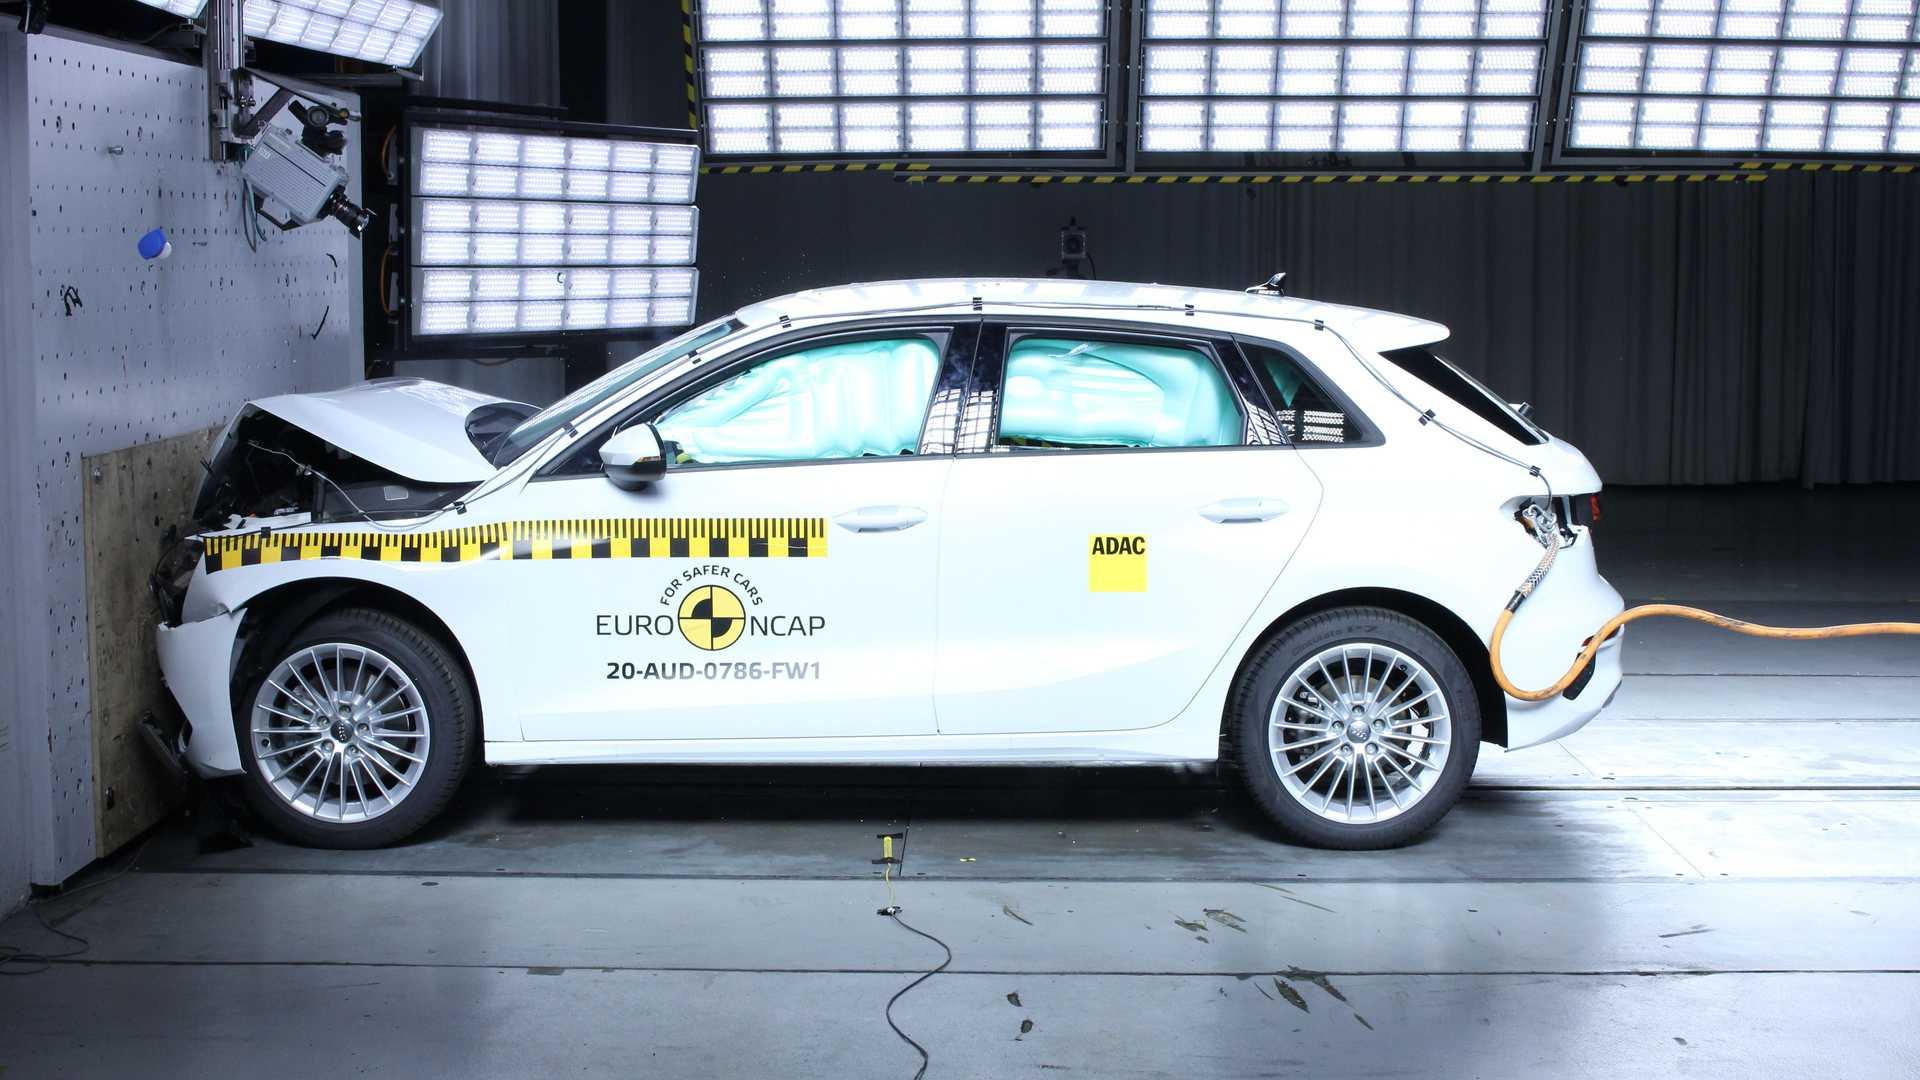 Crash test Euro NCAP, 5 stelle ad A3, D-Max, Sorento, Defender e Leon